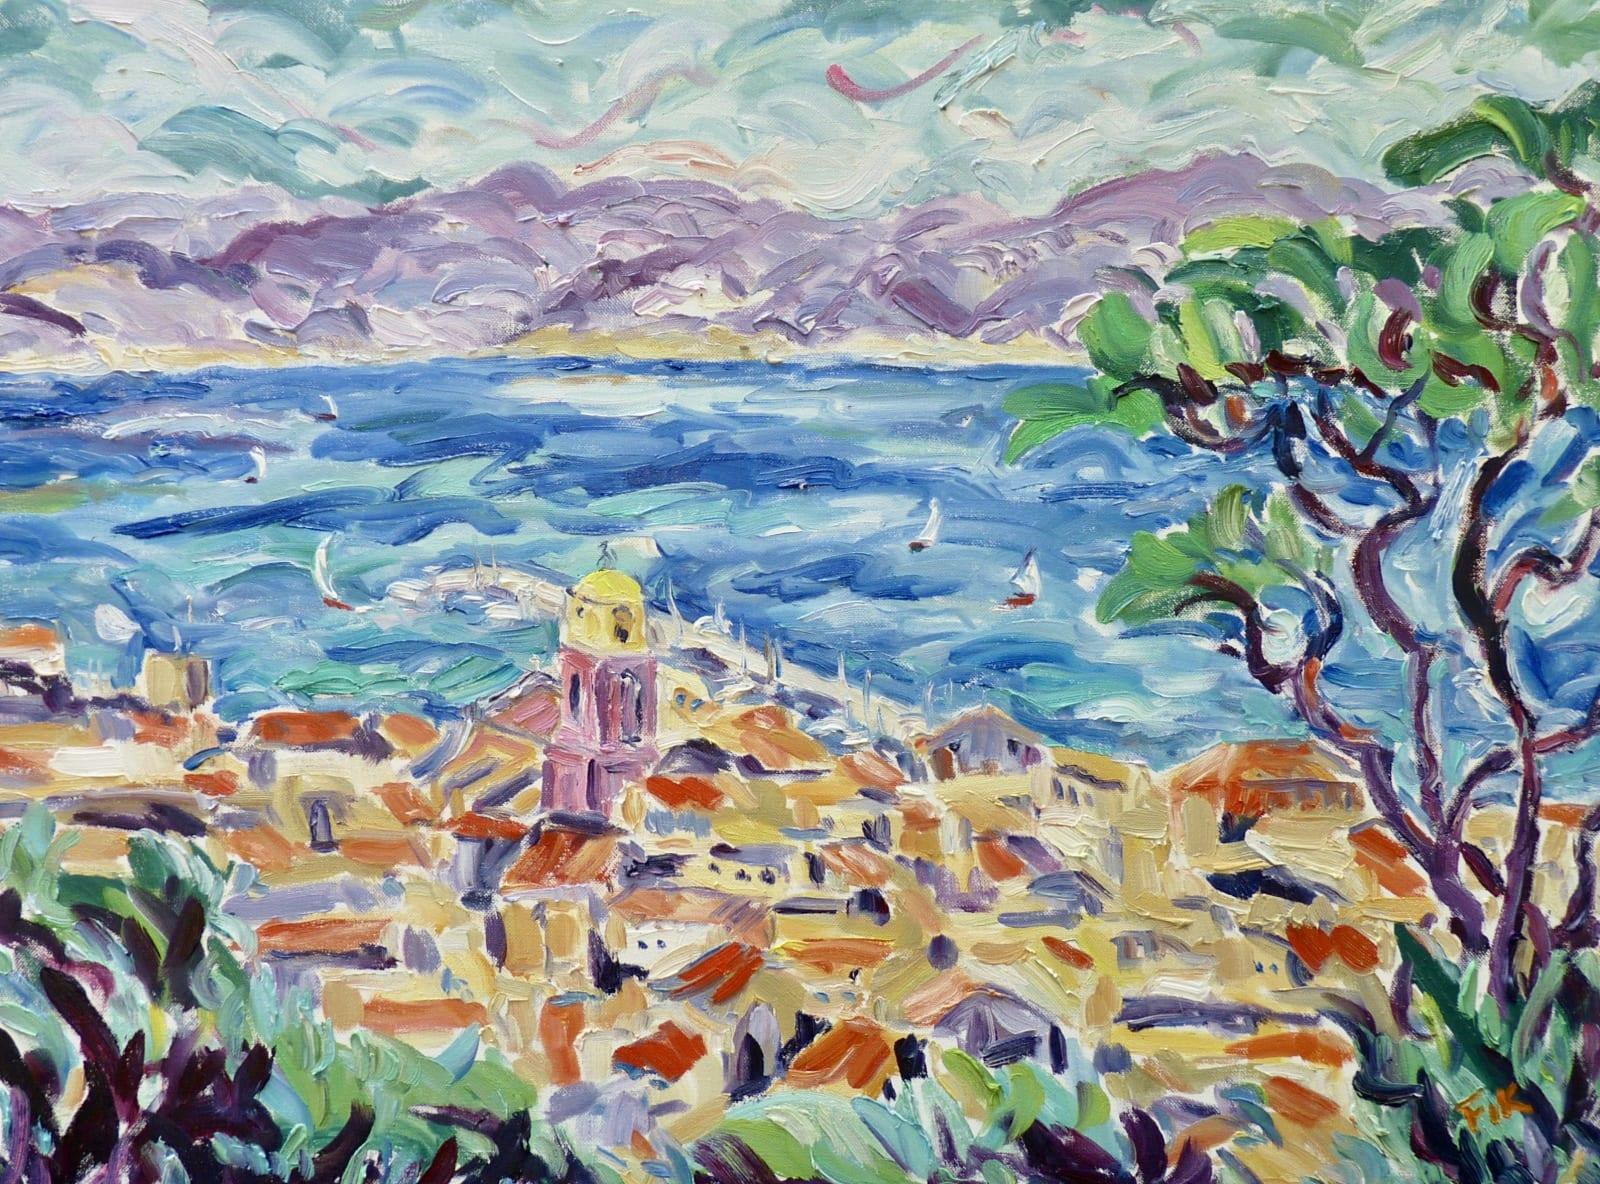 Fi Katzler, Afternoon Sun at St Tropez